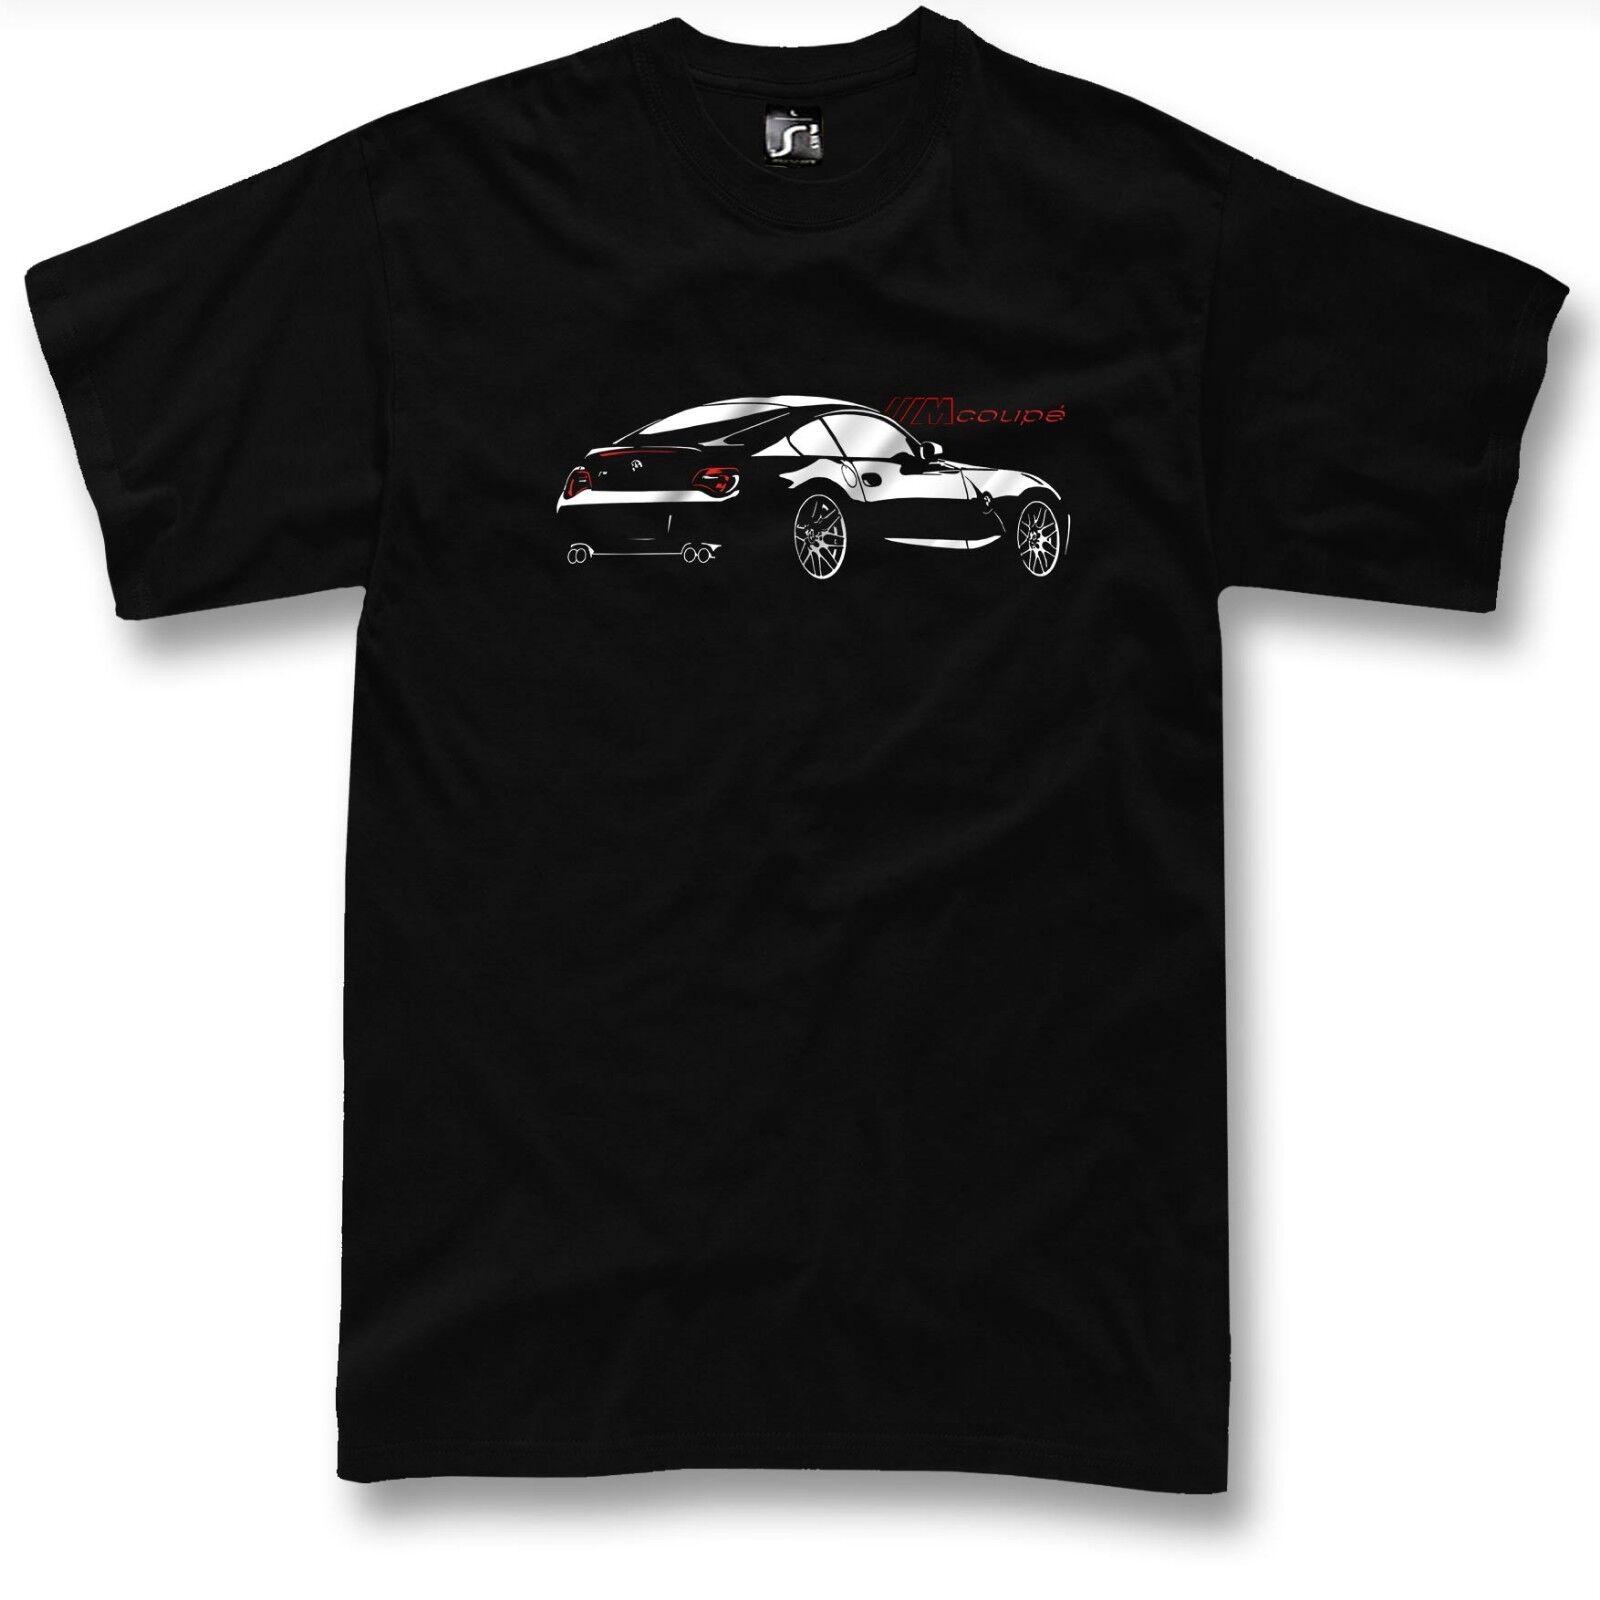 T-shirt for z4 coupe fans E86 s-5XL